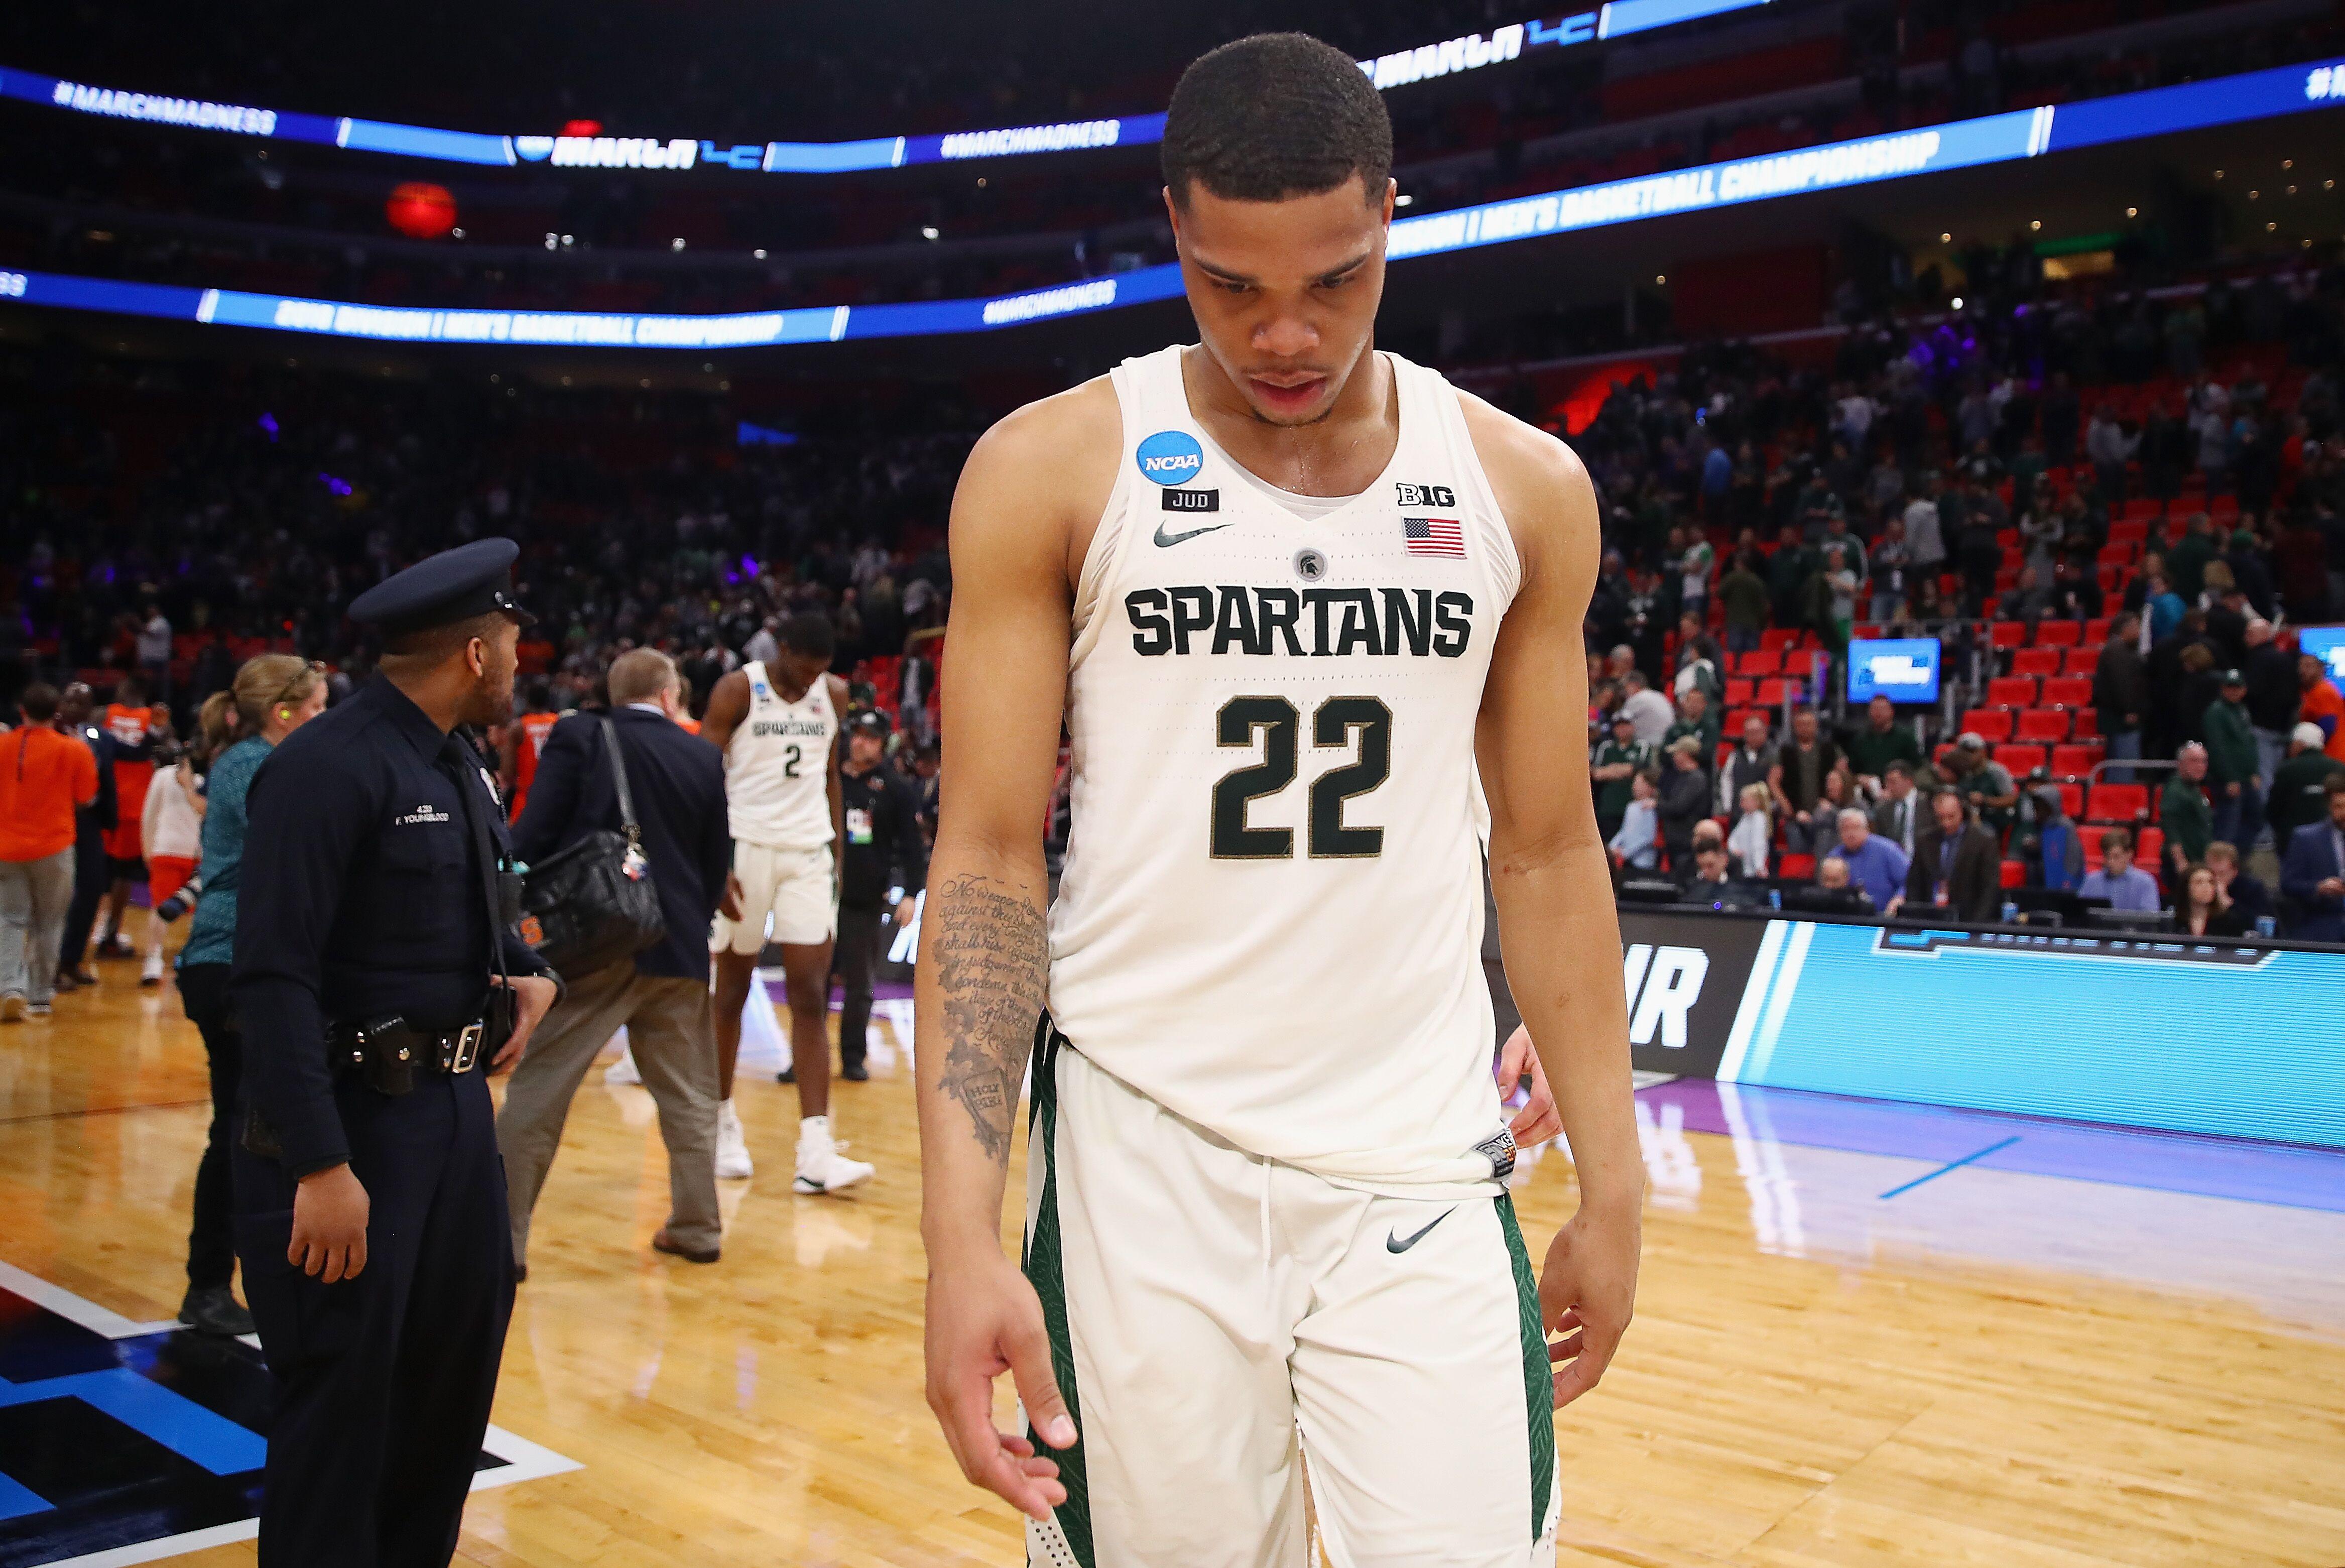 reputable site a8c13 2b45c Michigan State Basketball: Is a Miles Bridges return realistic?